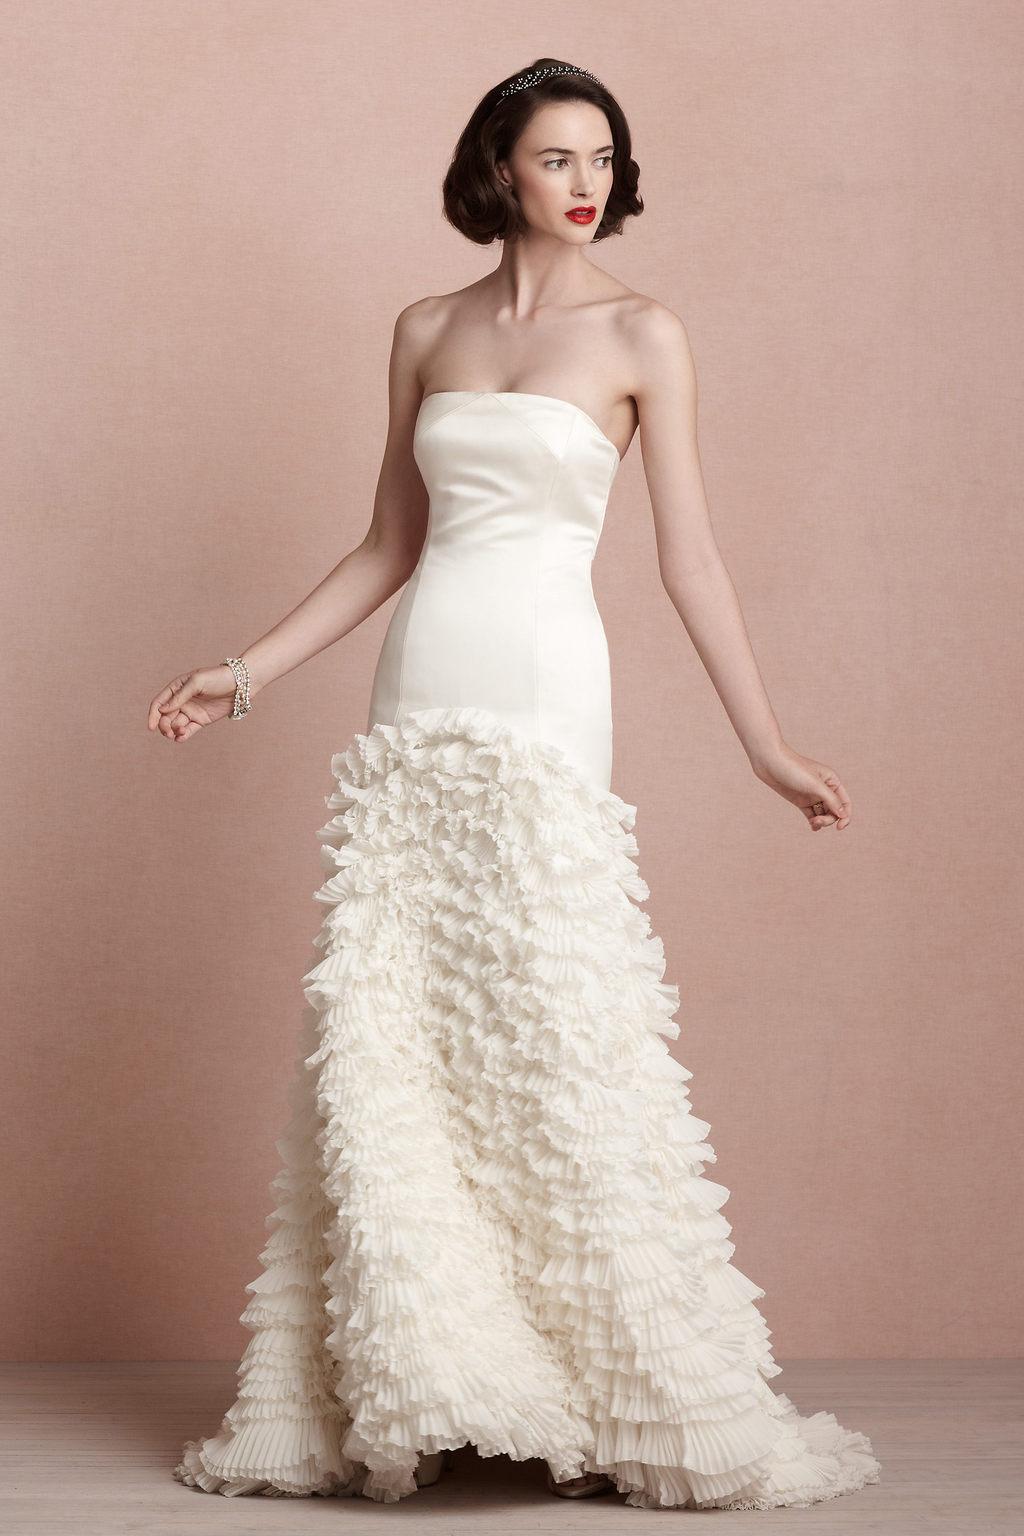 New-bhldn-wedding-dress-for-brides-wedding-giveaway-2.full